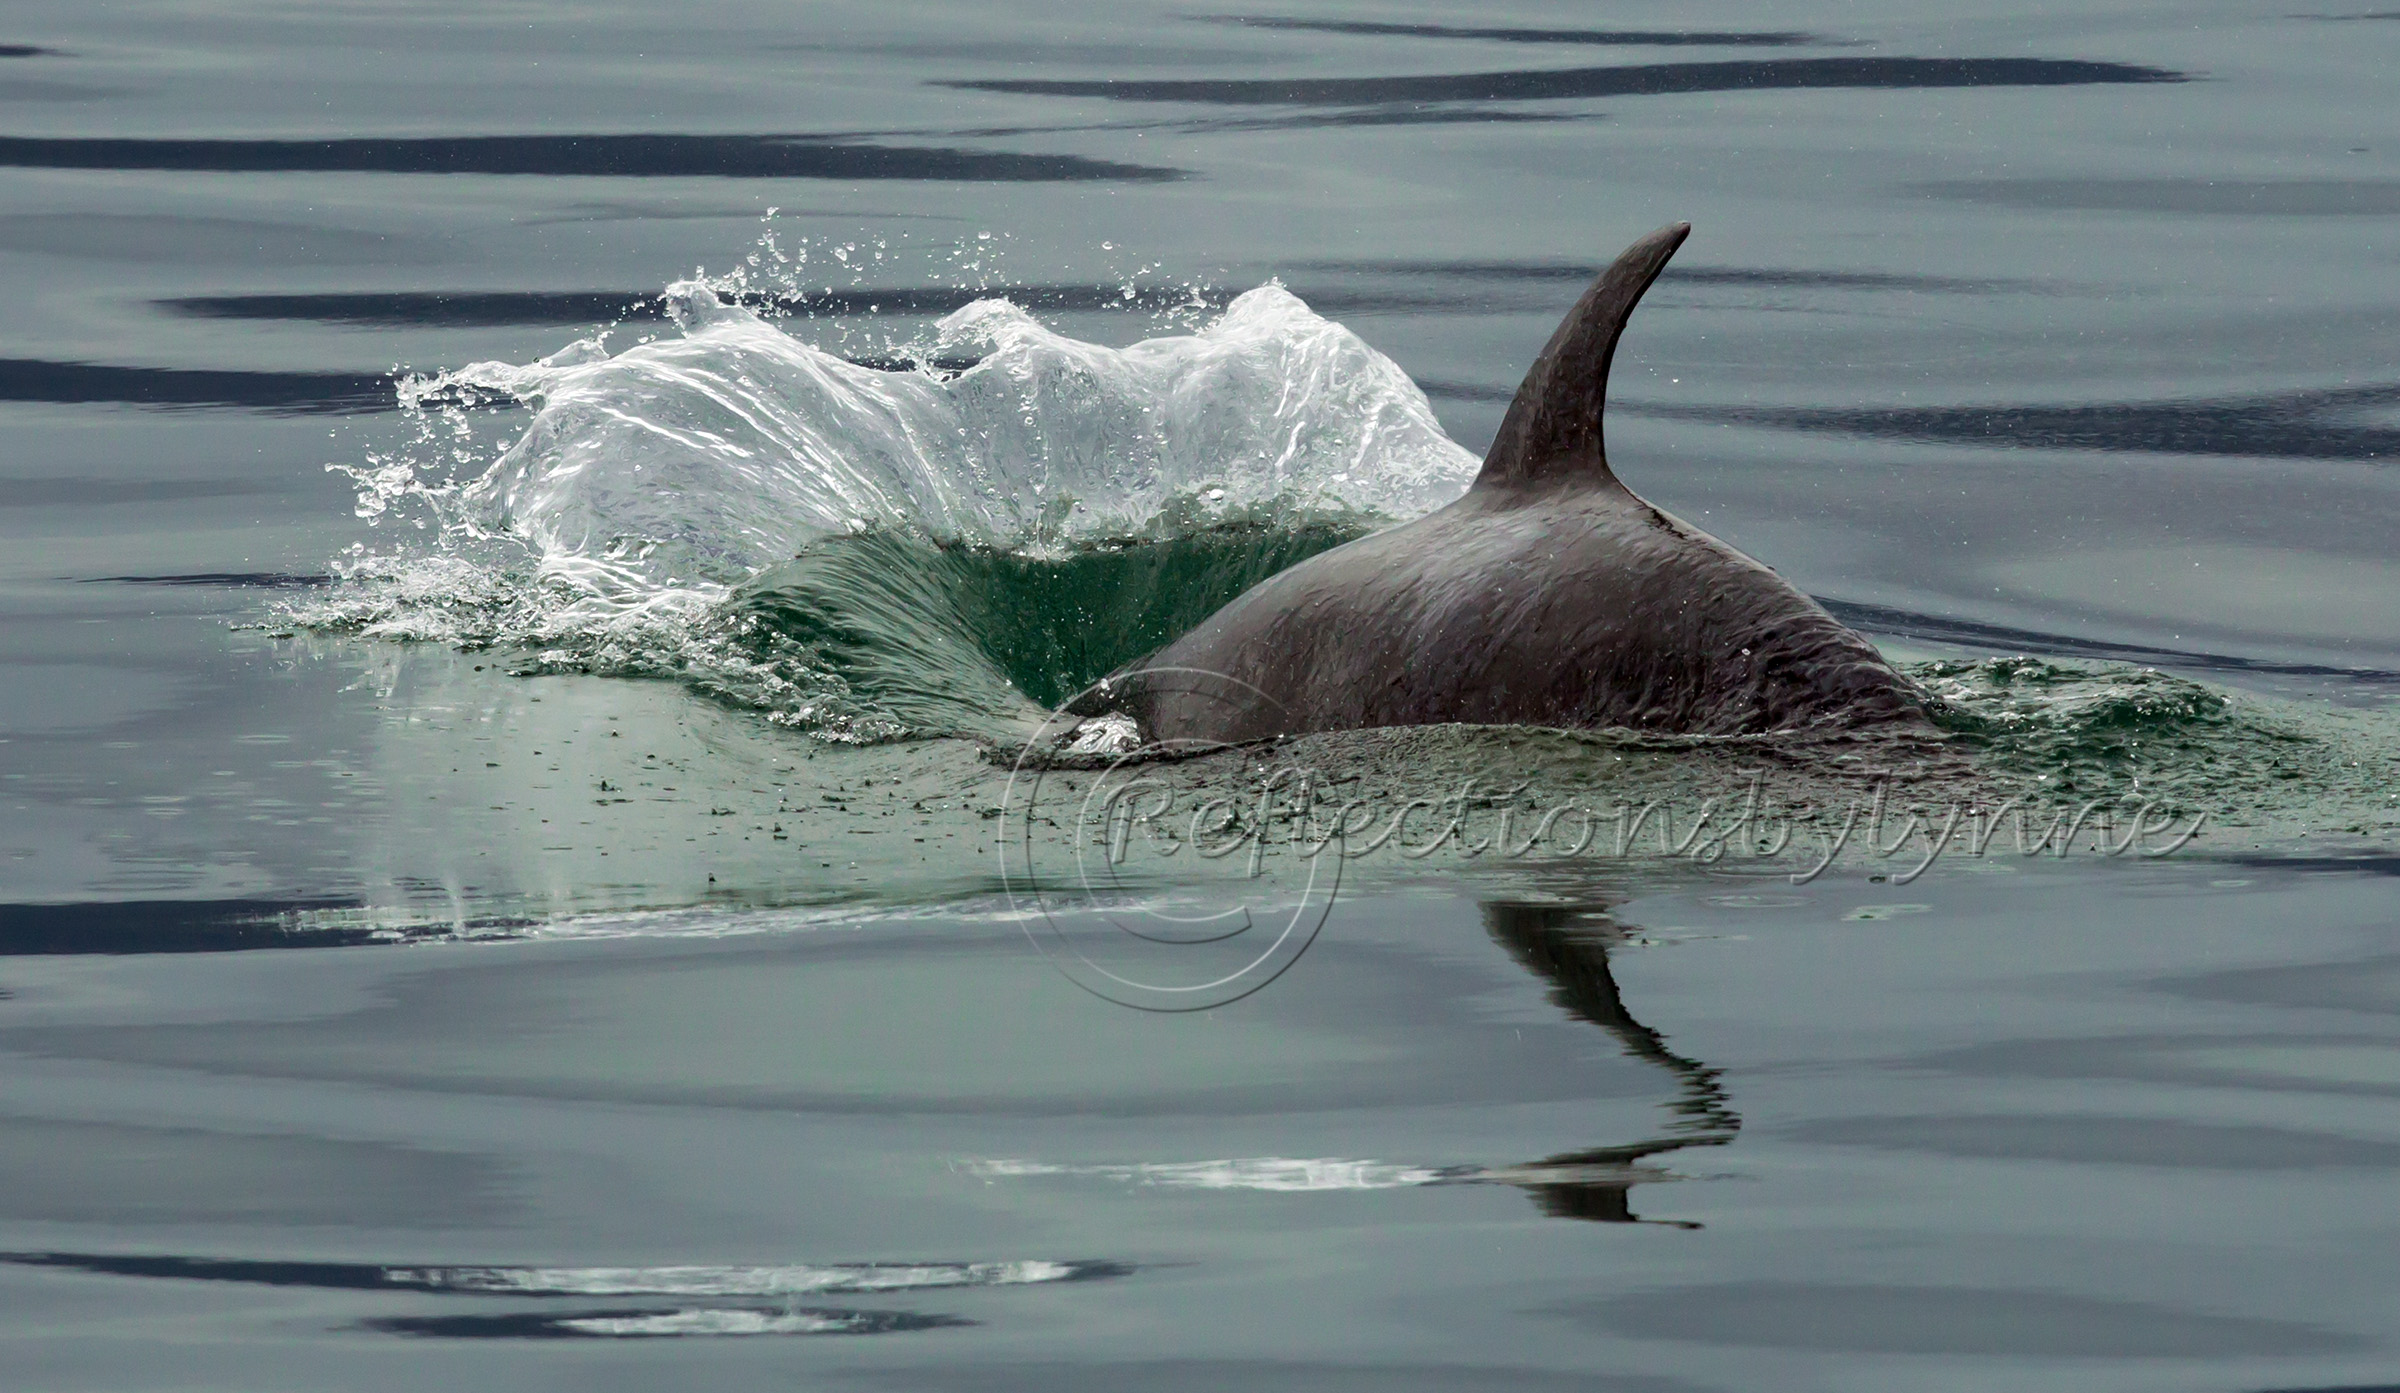 Diving Orca.jpg